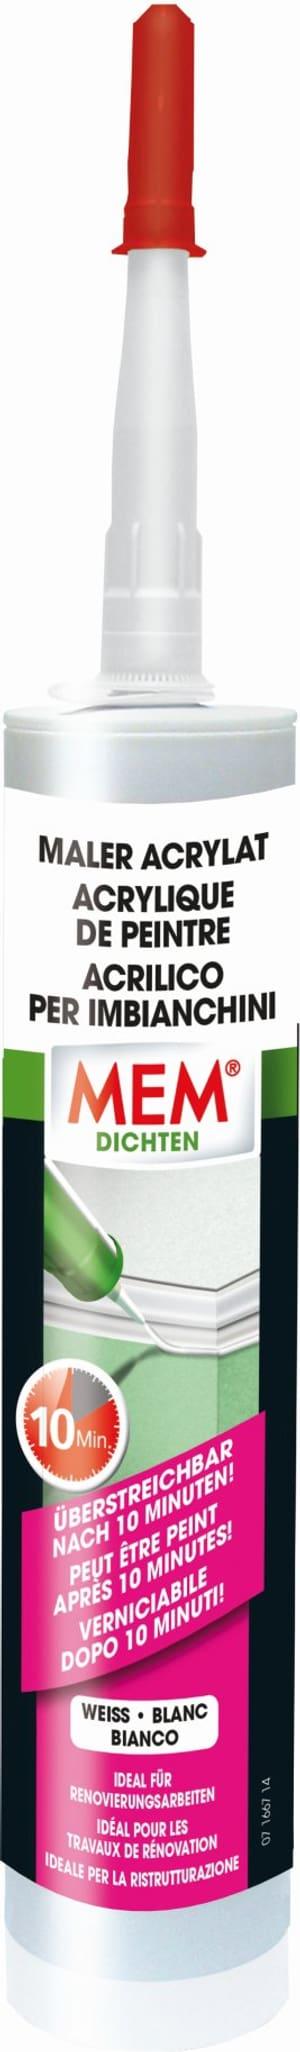 Acrilico per imbianchini bianco, 300 ml